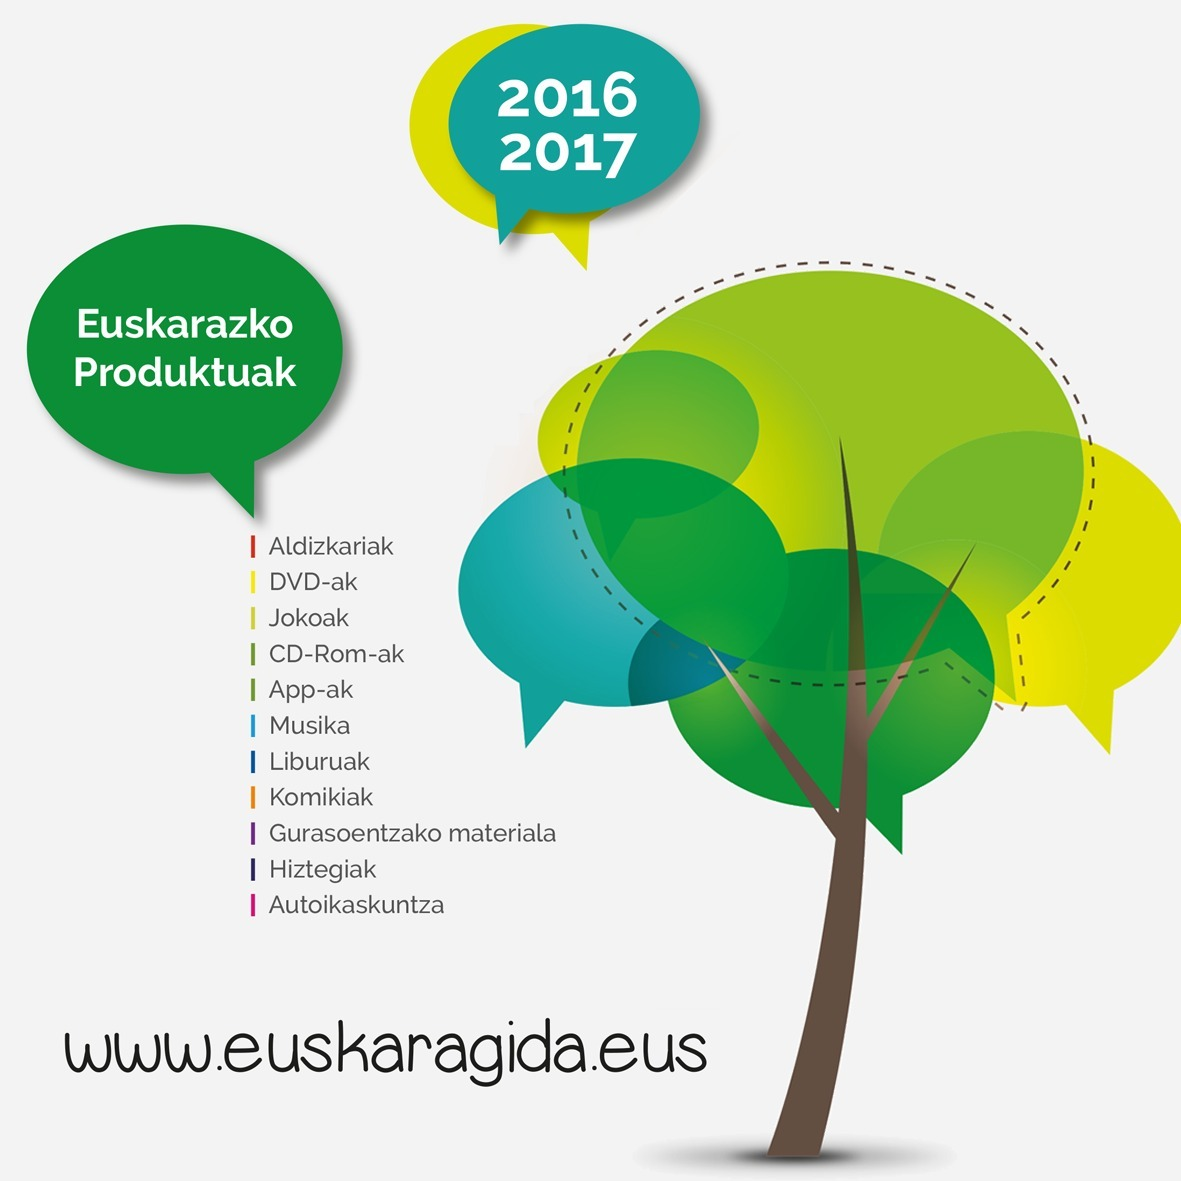 euskaragida 2016 web.jpg